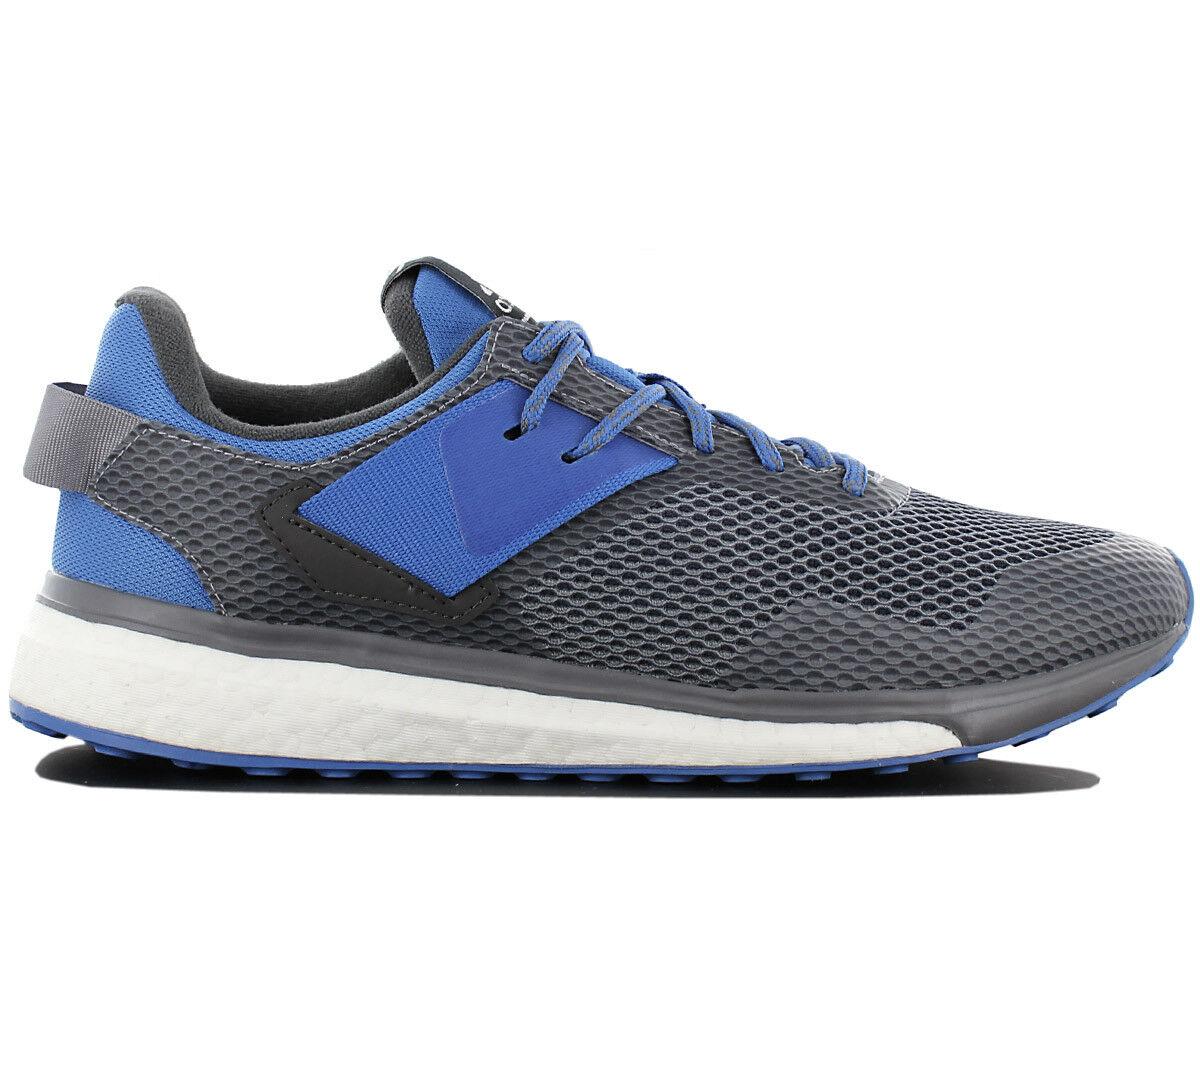 Adidas Response 3 M Boost Hommes Chaussures de Course Jogging Sport AQ2500